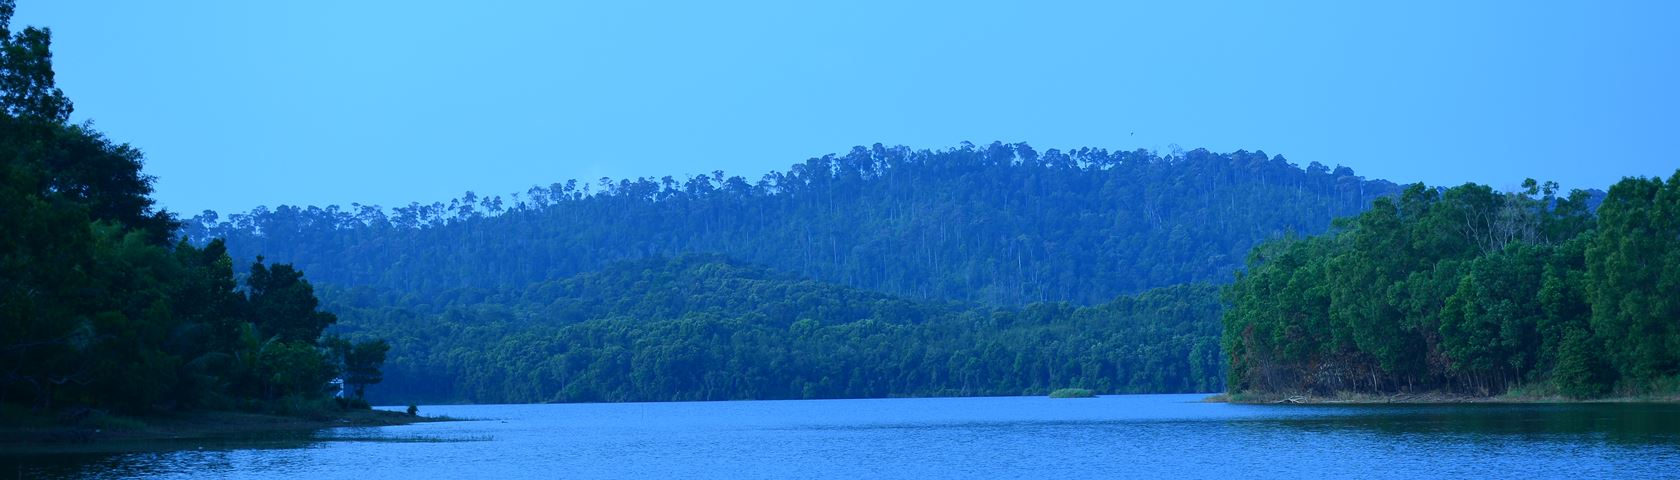 Sei Harapan Reservoir